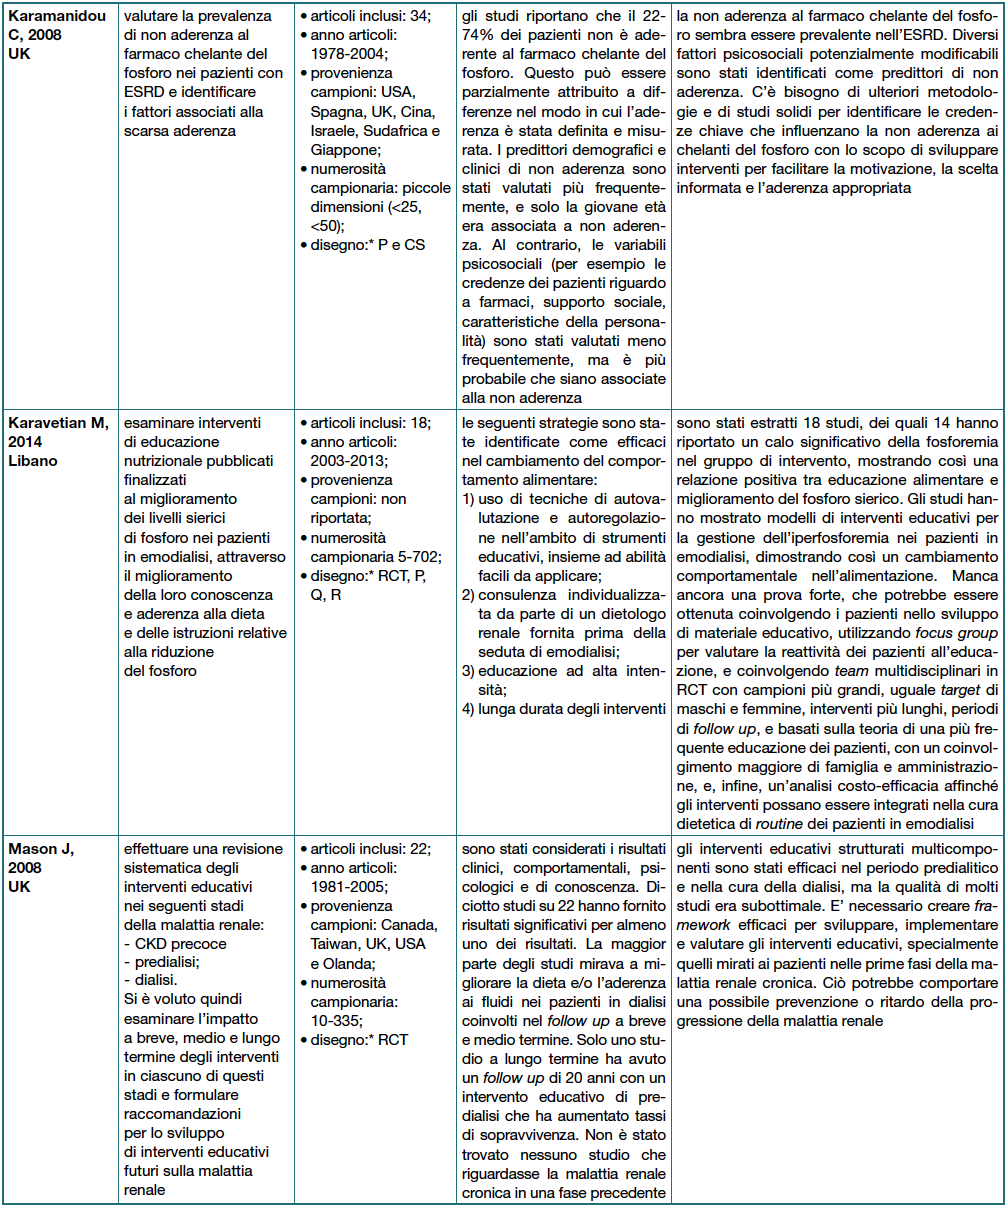 Tabella 4.2 - Sintesi degli studi revisionati